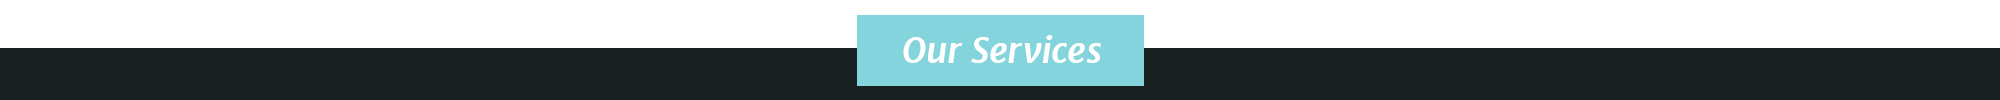 Services-Divider